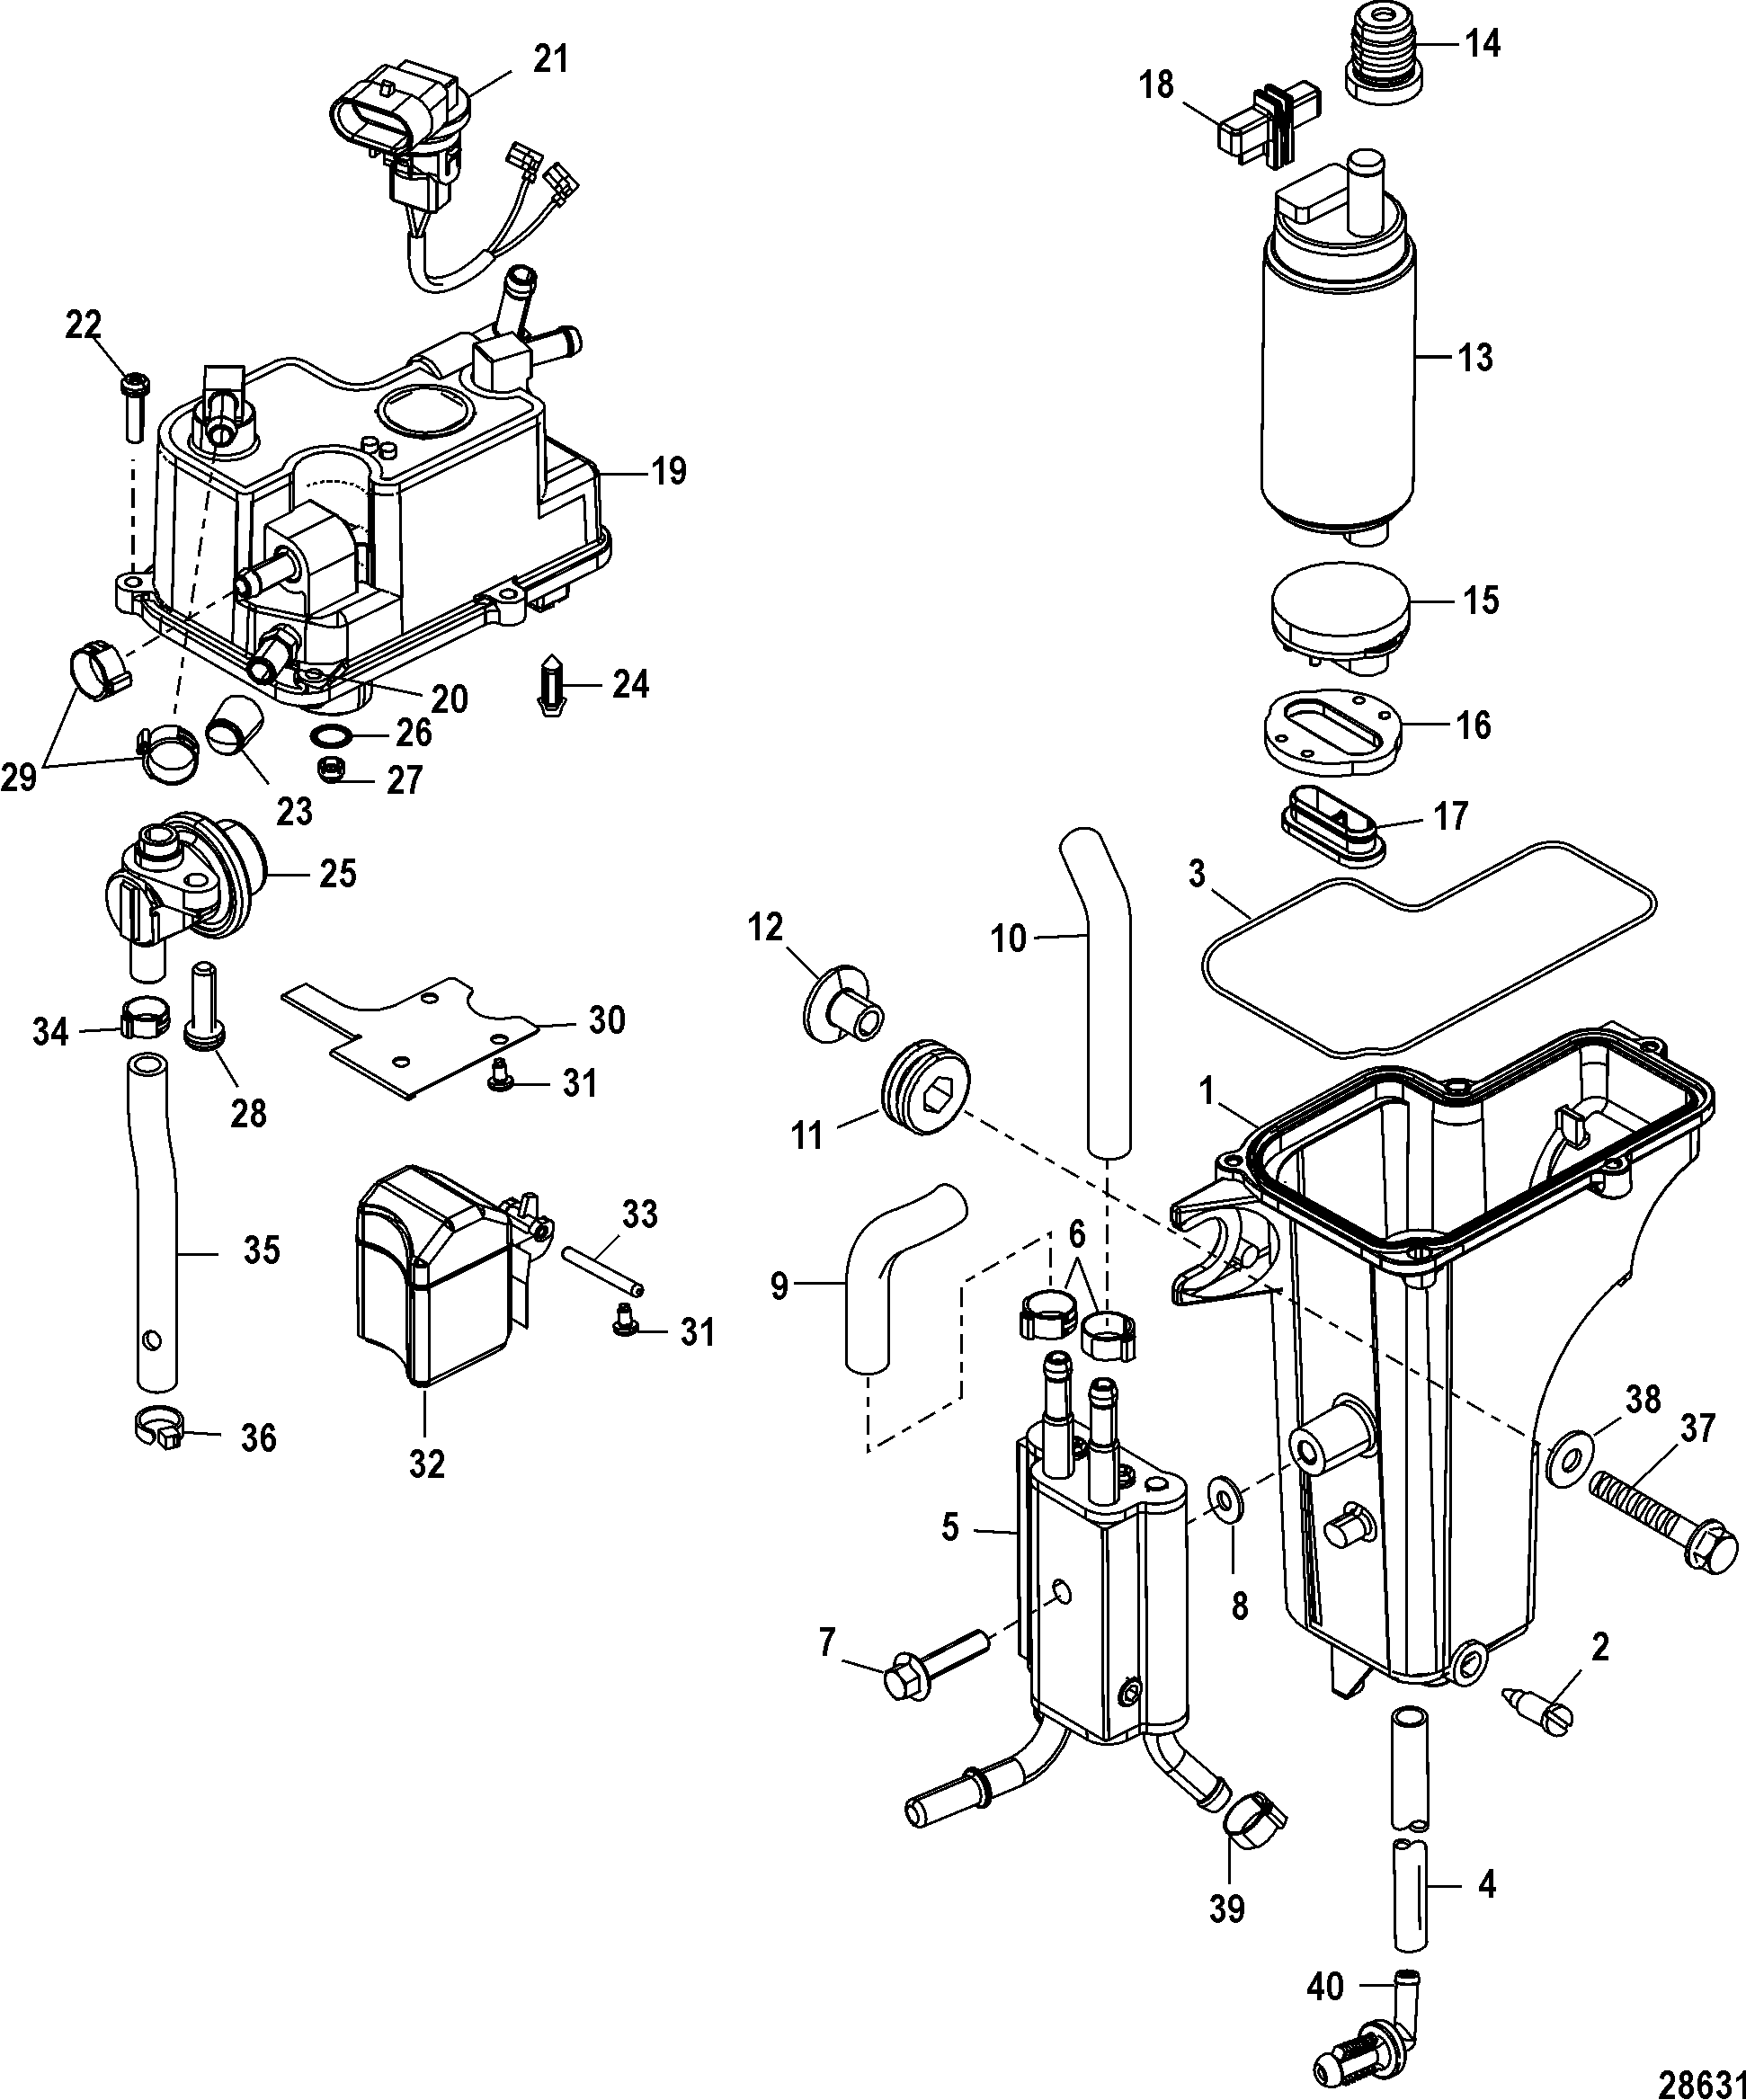 Mercury vapor separator